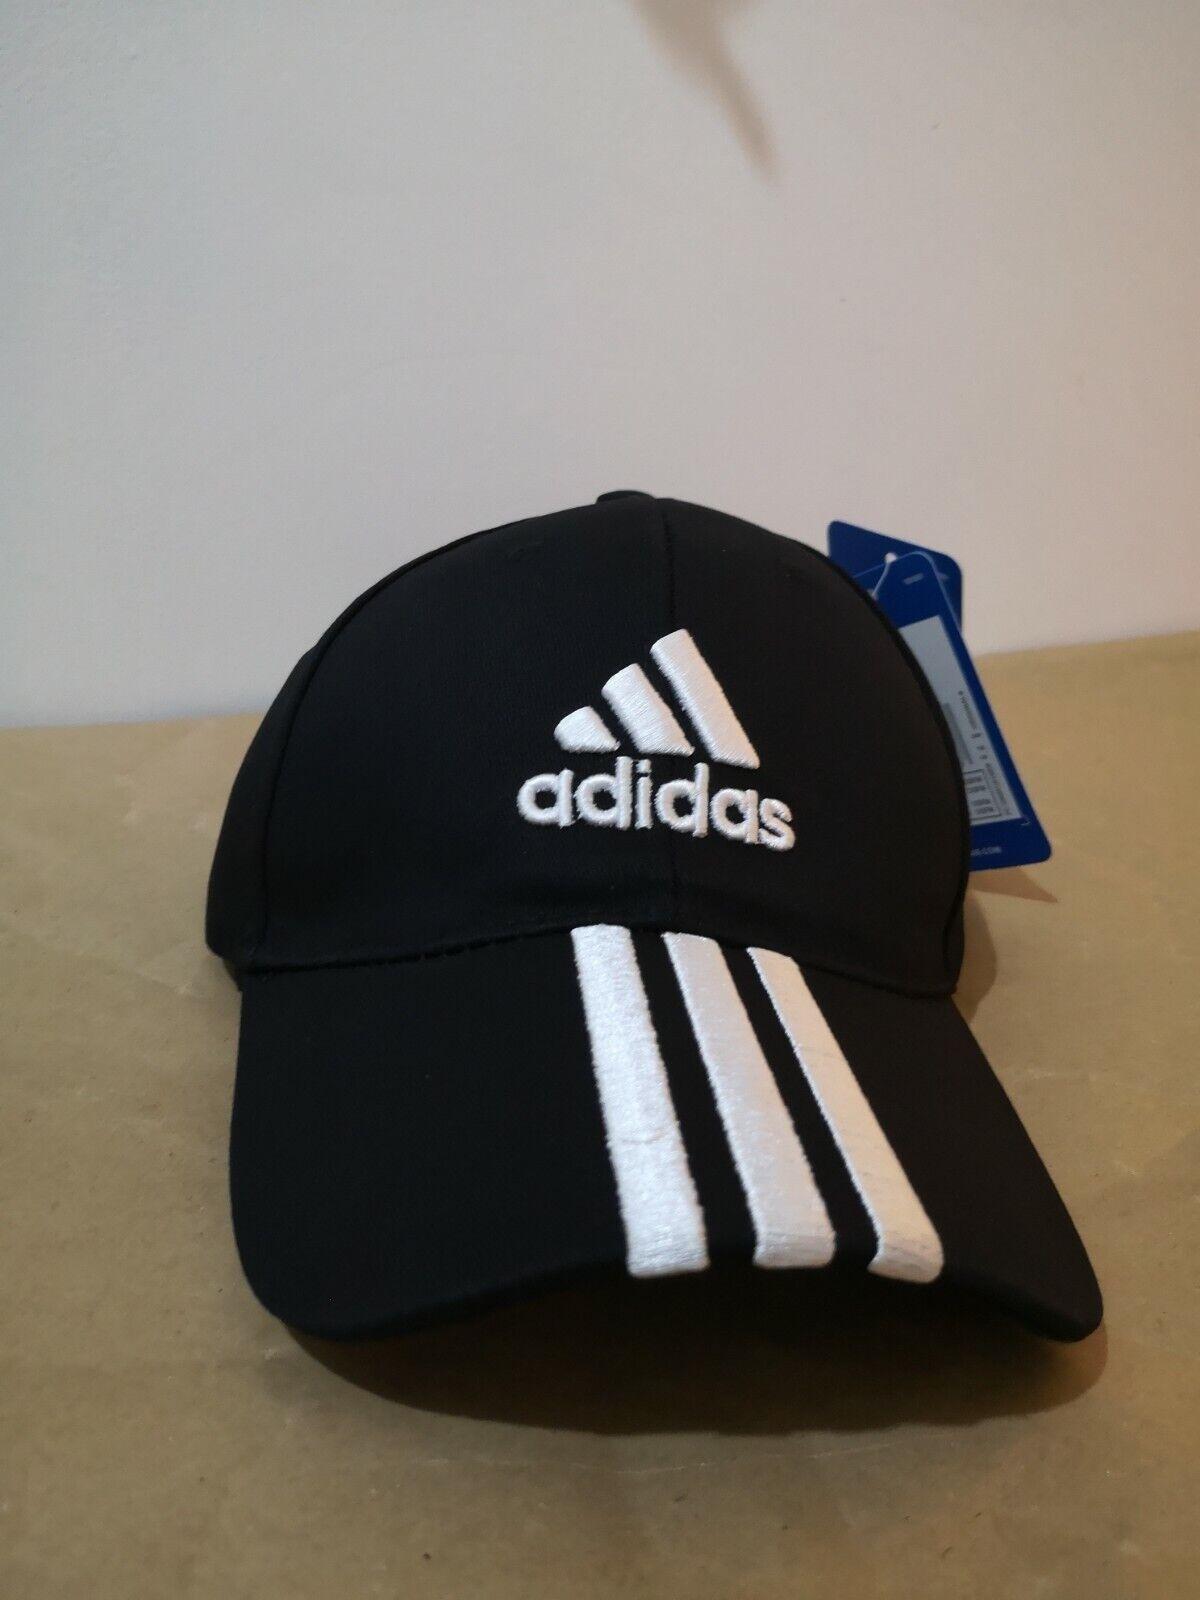 Adidas Baseball Caps Swoosh Metal Logo Sports Adjustable Hats man and women